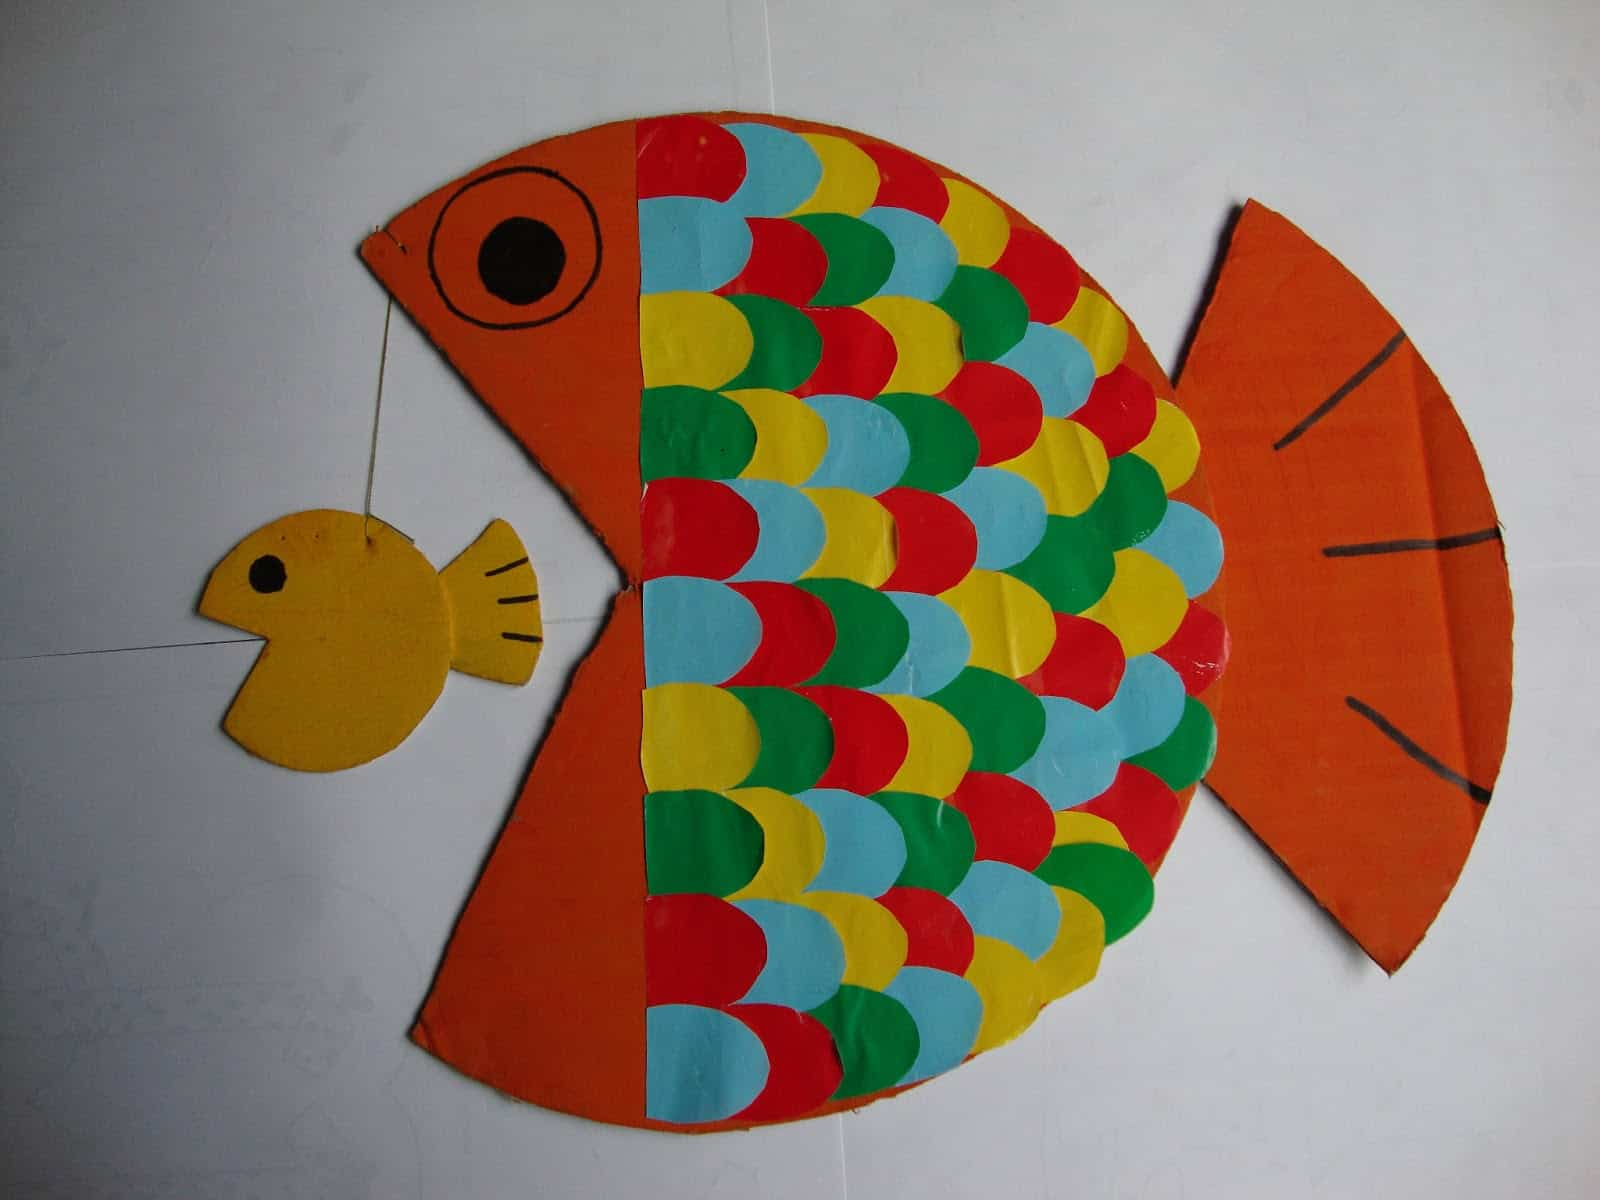 peces de colores1